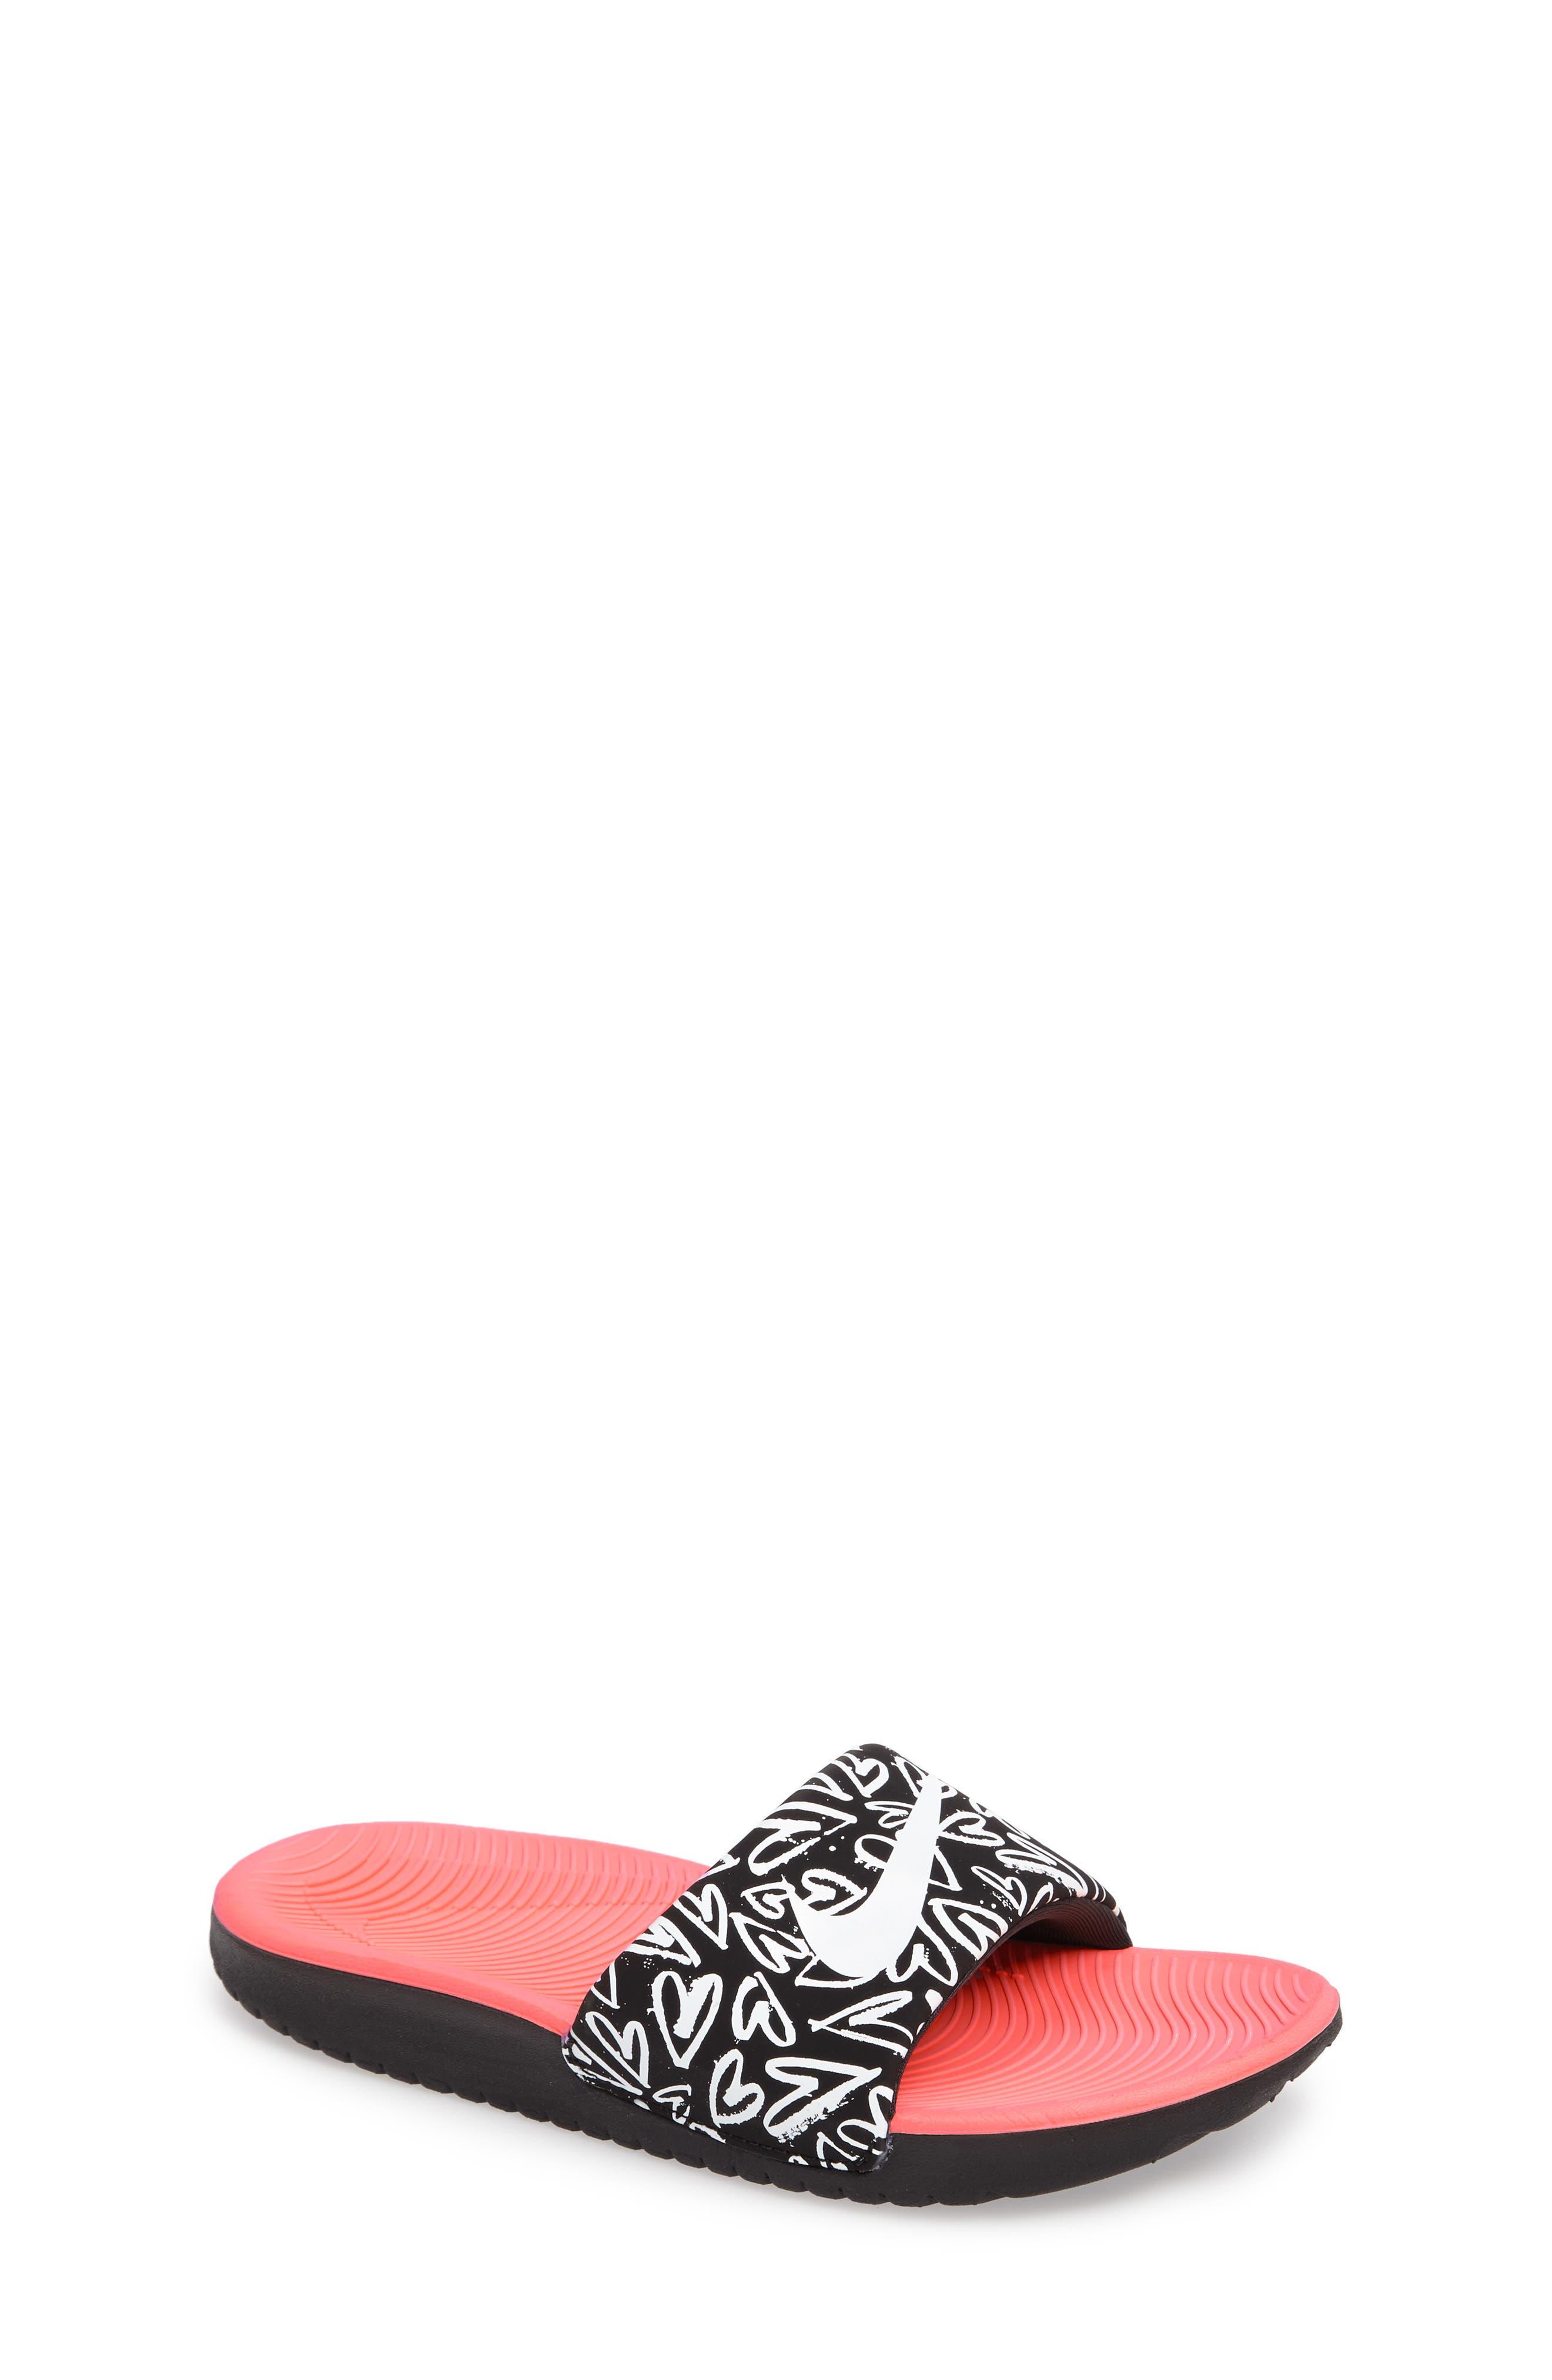 'Kawa' Print Slide Sandal,                             Main thumbnail 4, color,